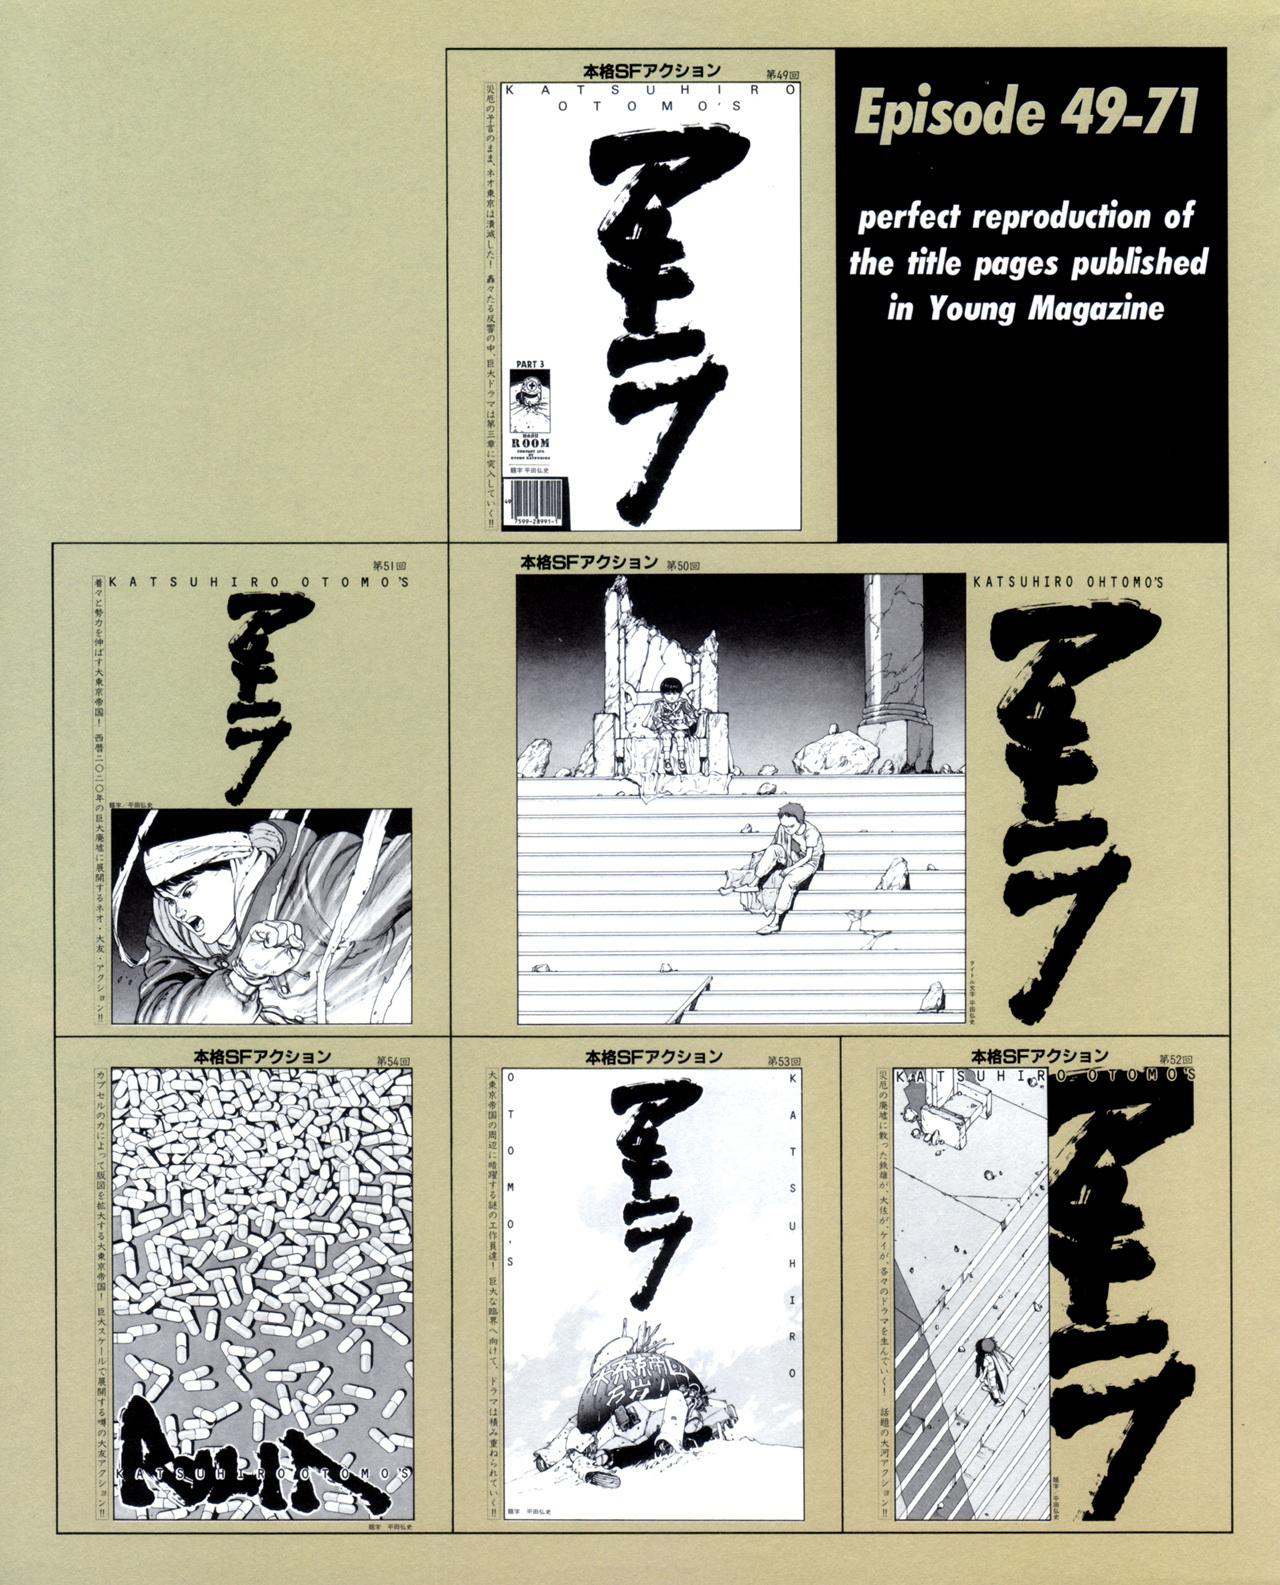 Akira by Katsuhiro Otomo - Fonts In Use